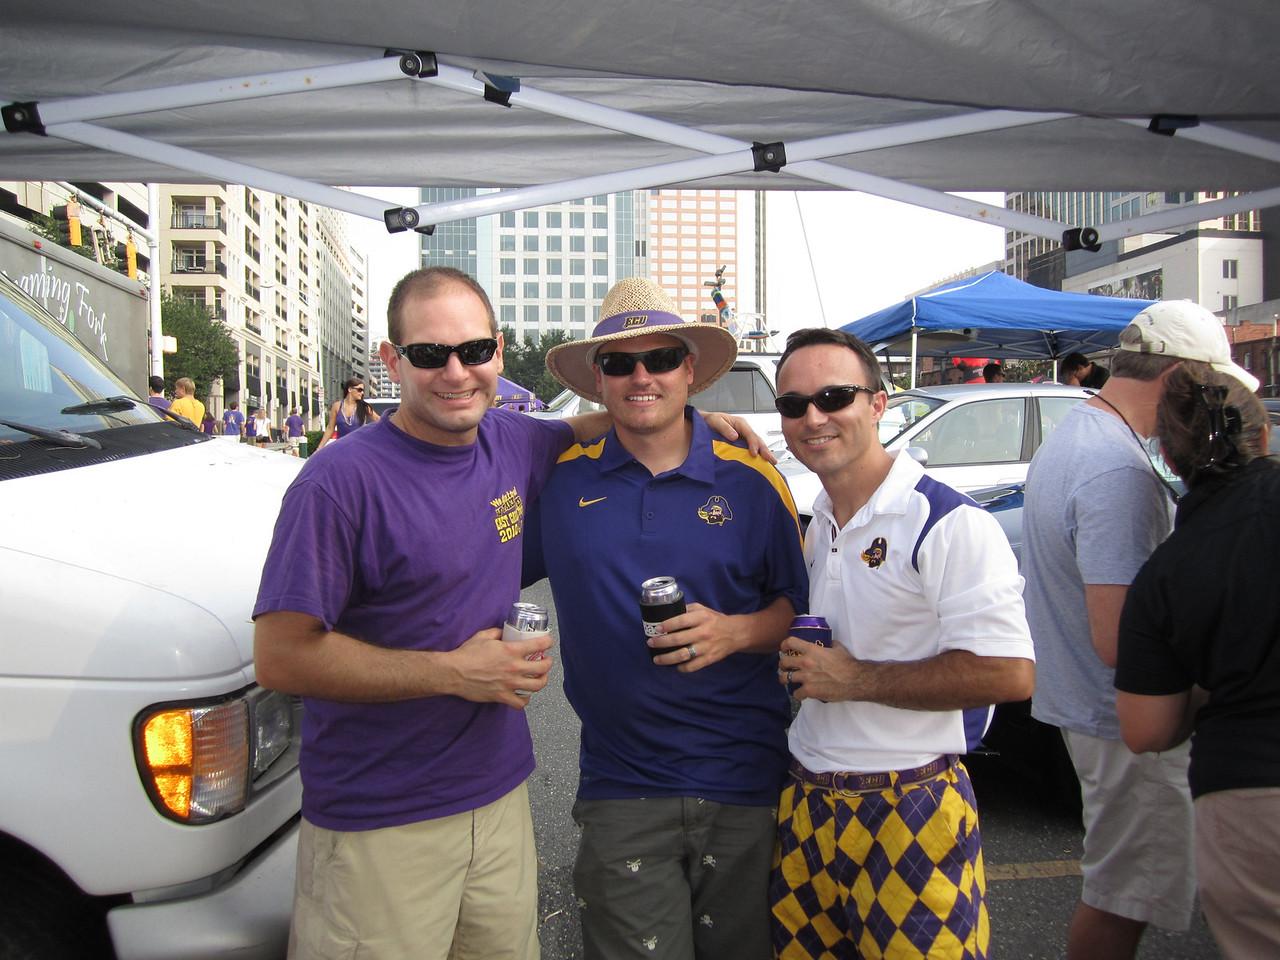 9/3/2011 ECU vs South Carolina  Jon, JG, Chris